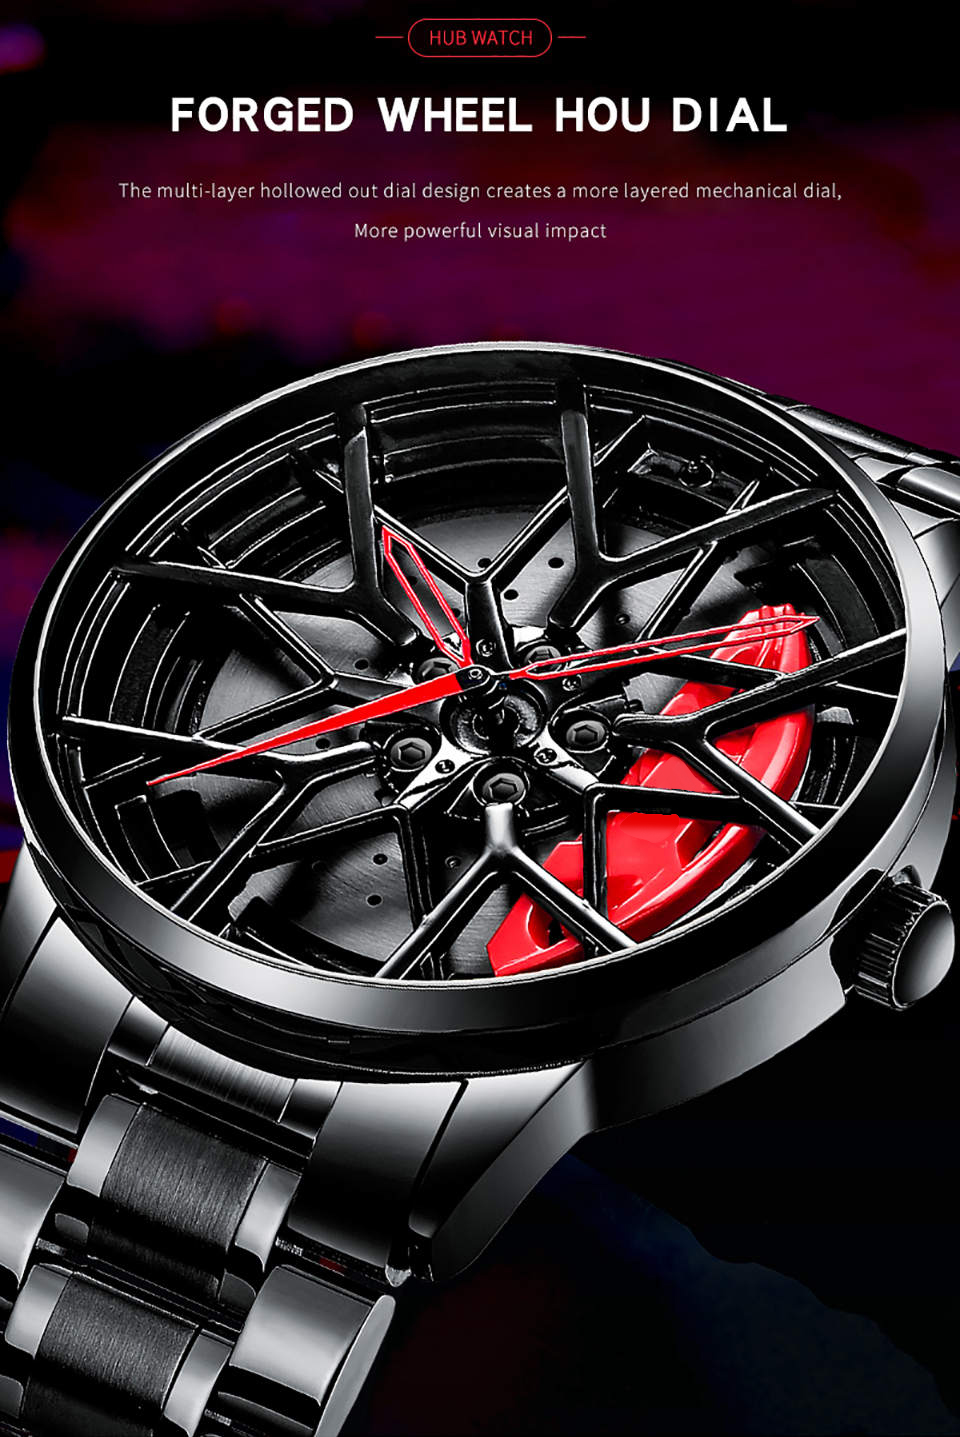 H1cd33a3f2cea419c9a6c2c5329a8a284N NIBOSI 2020 Car Rim Hub Wheel Watch Custom Design